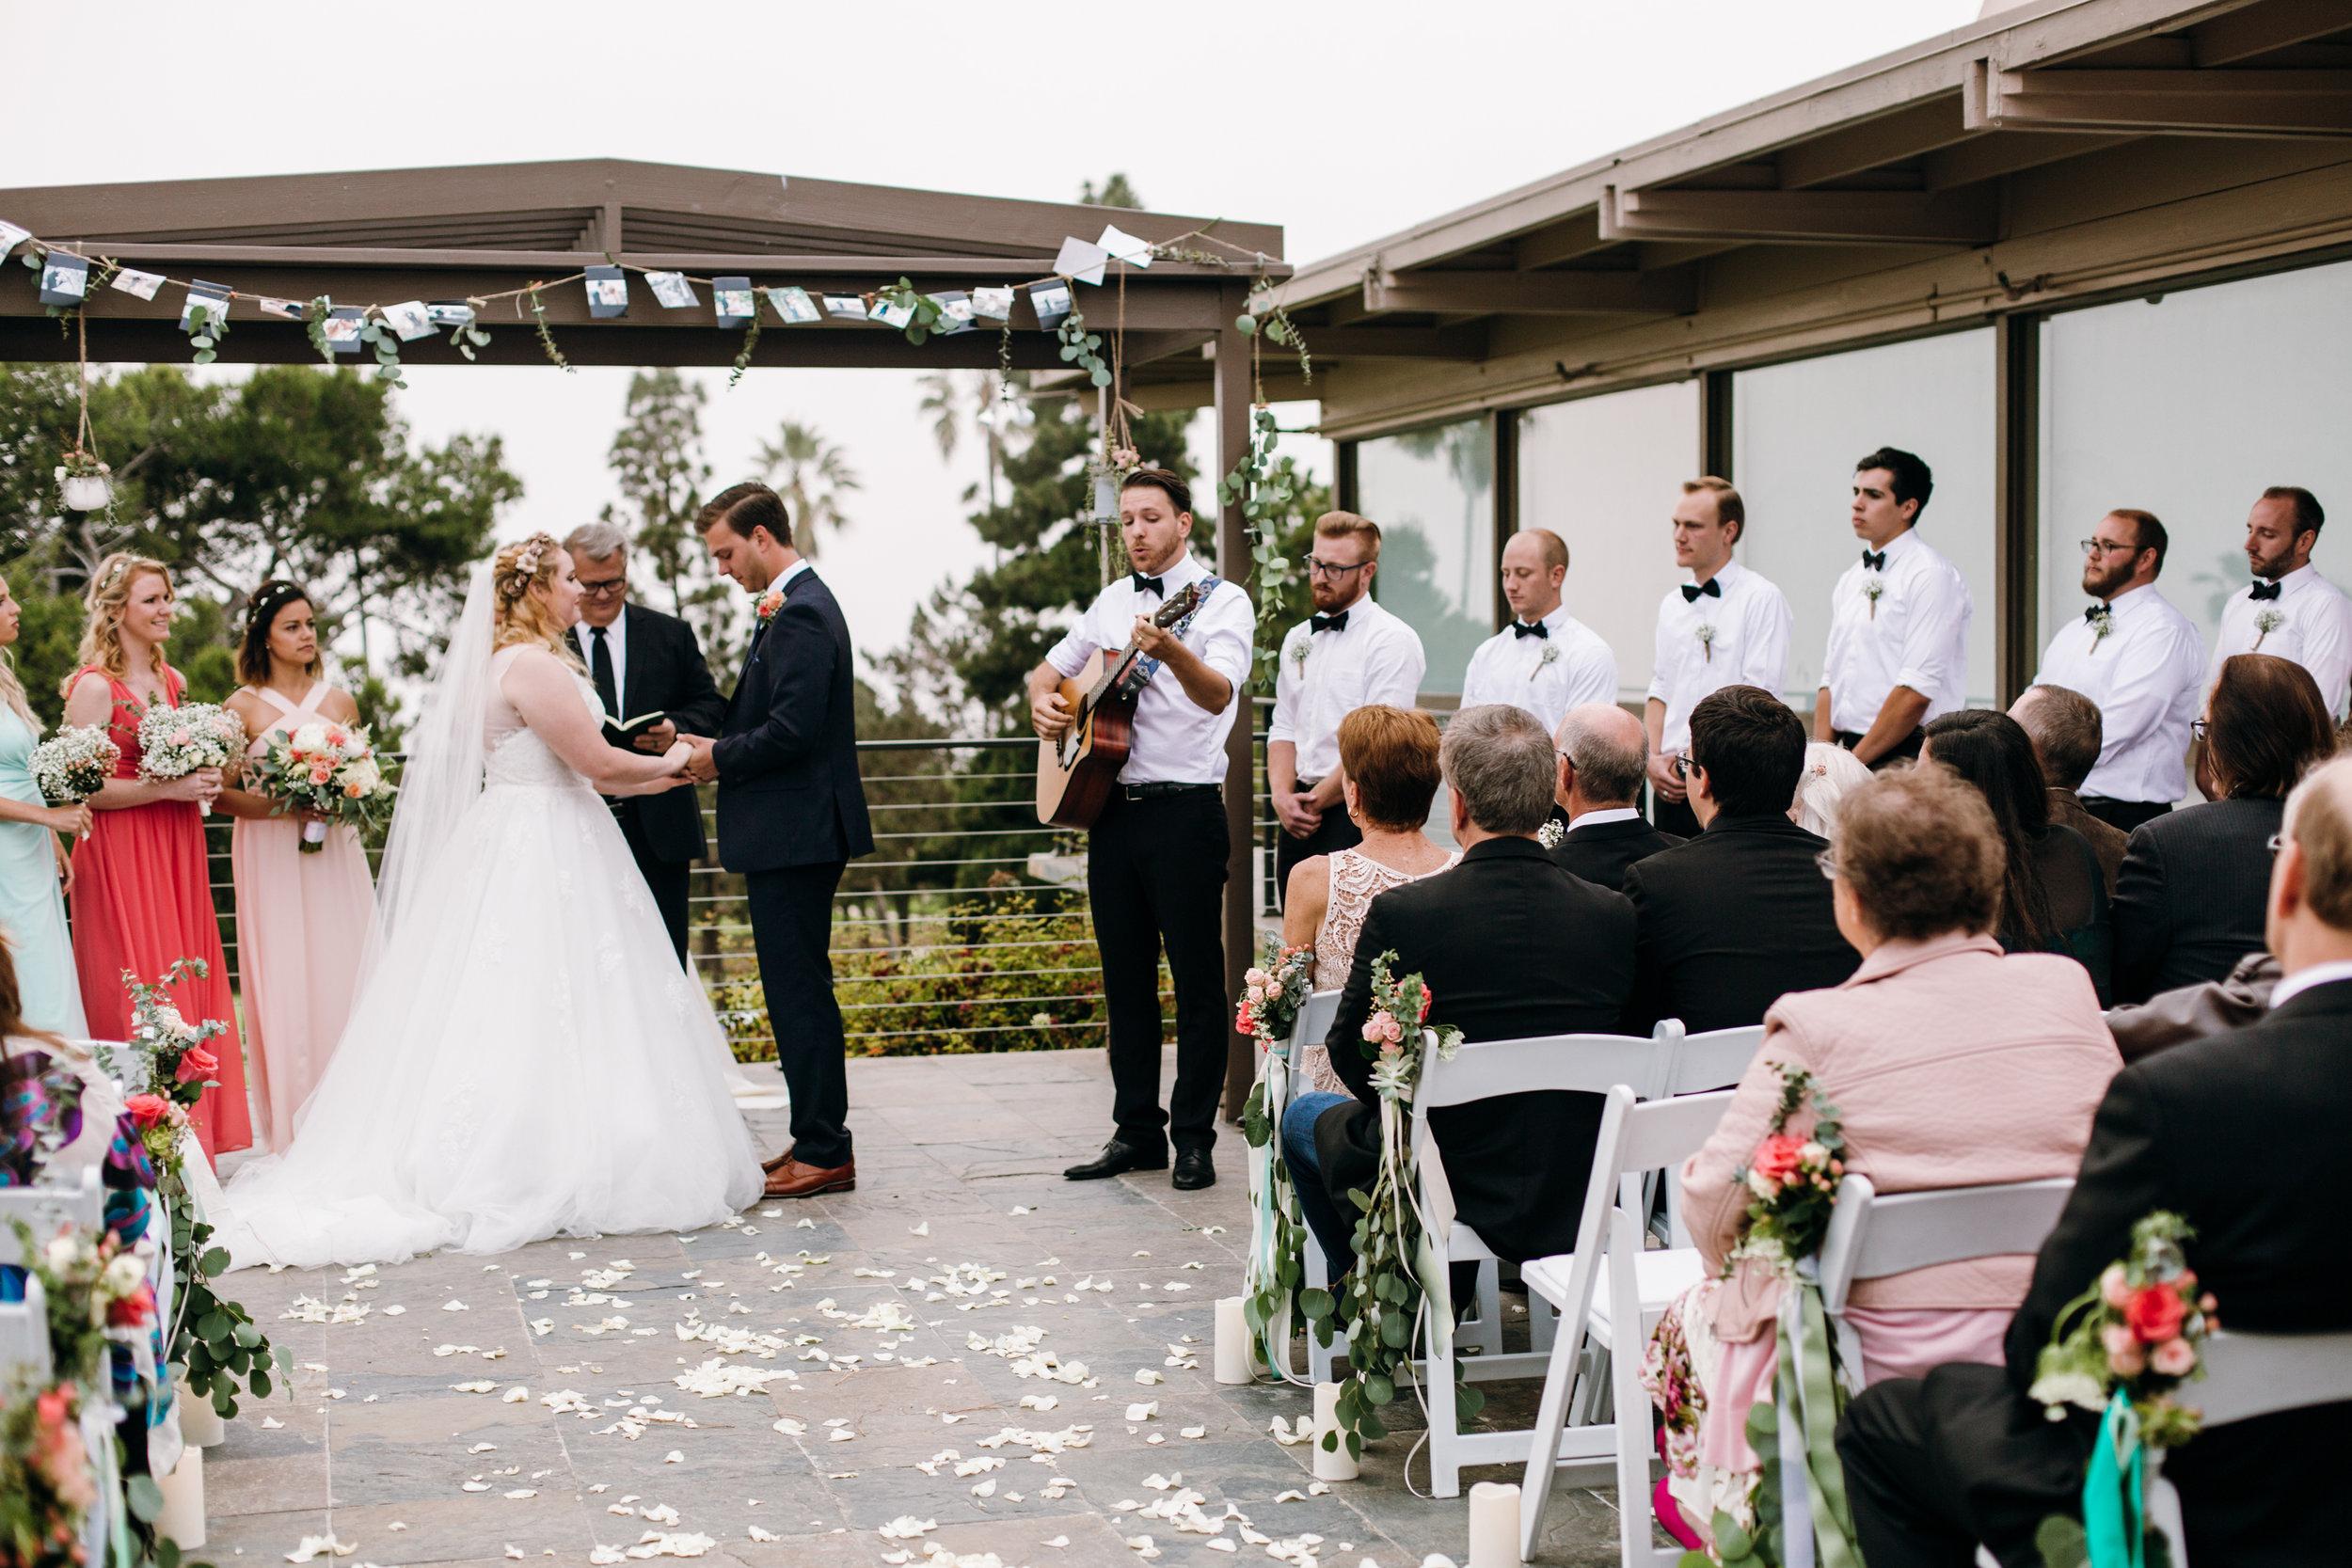 KaraNixonWeddings-PalosVerdes-Wedding-29.jpg